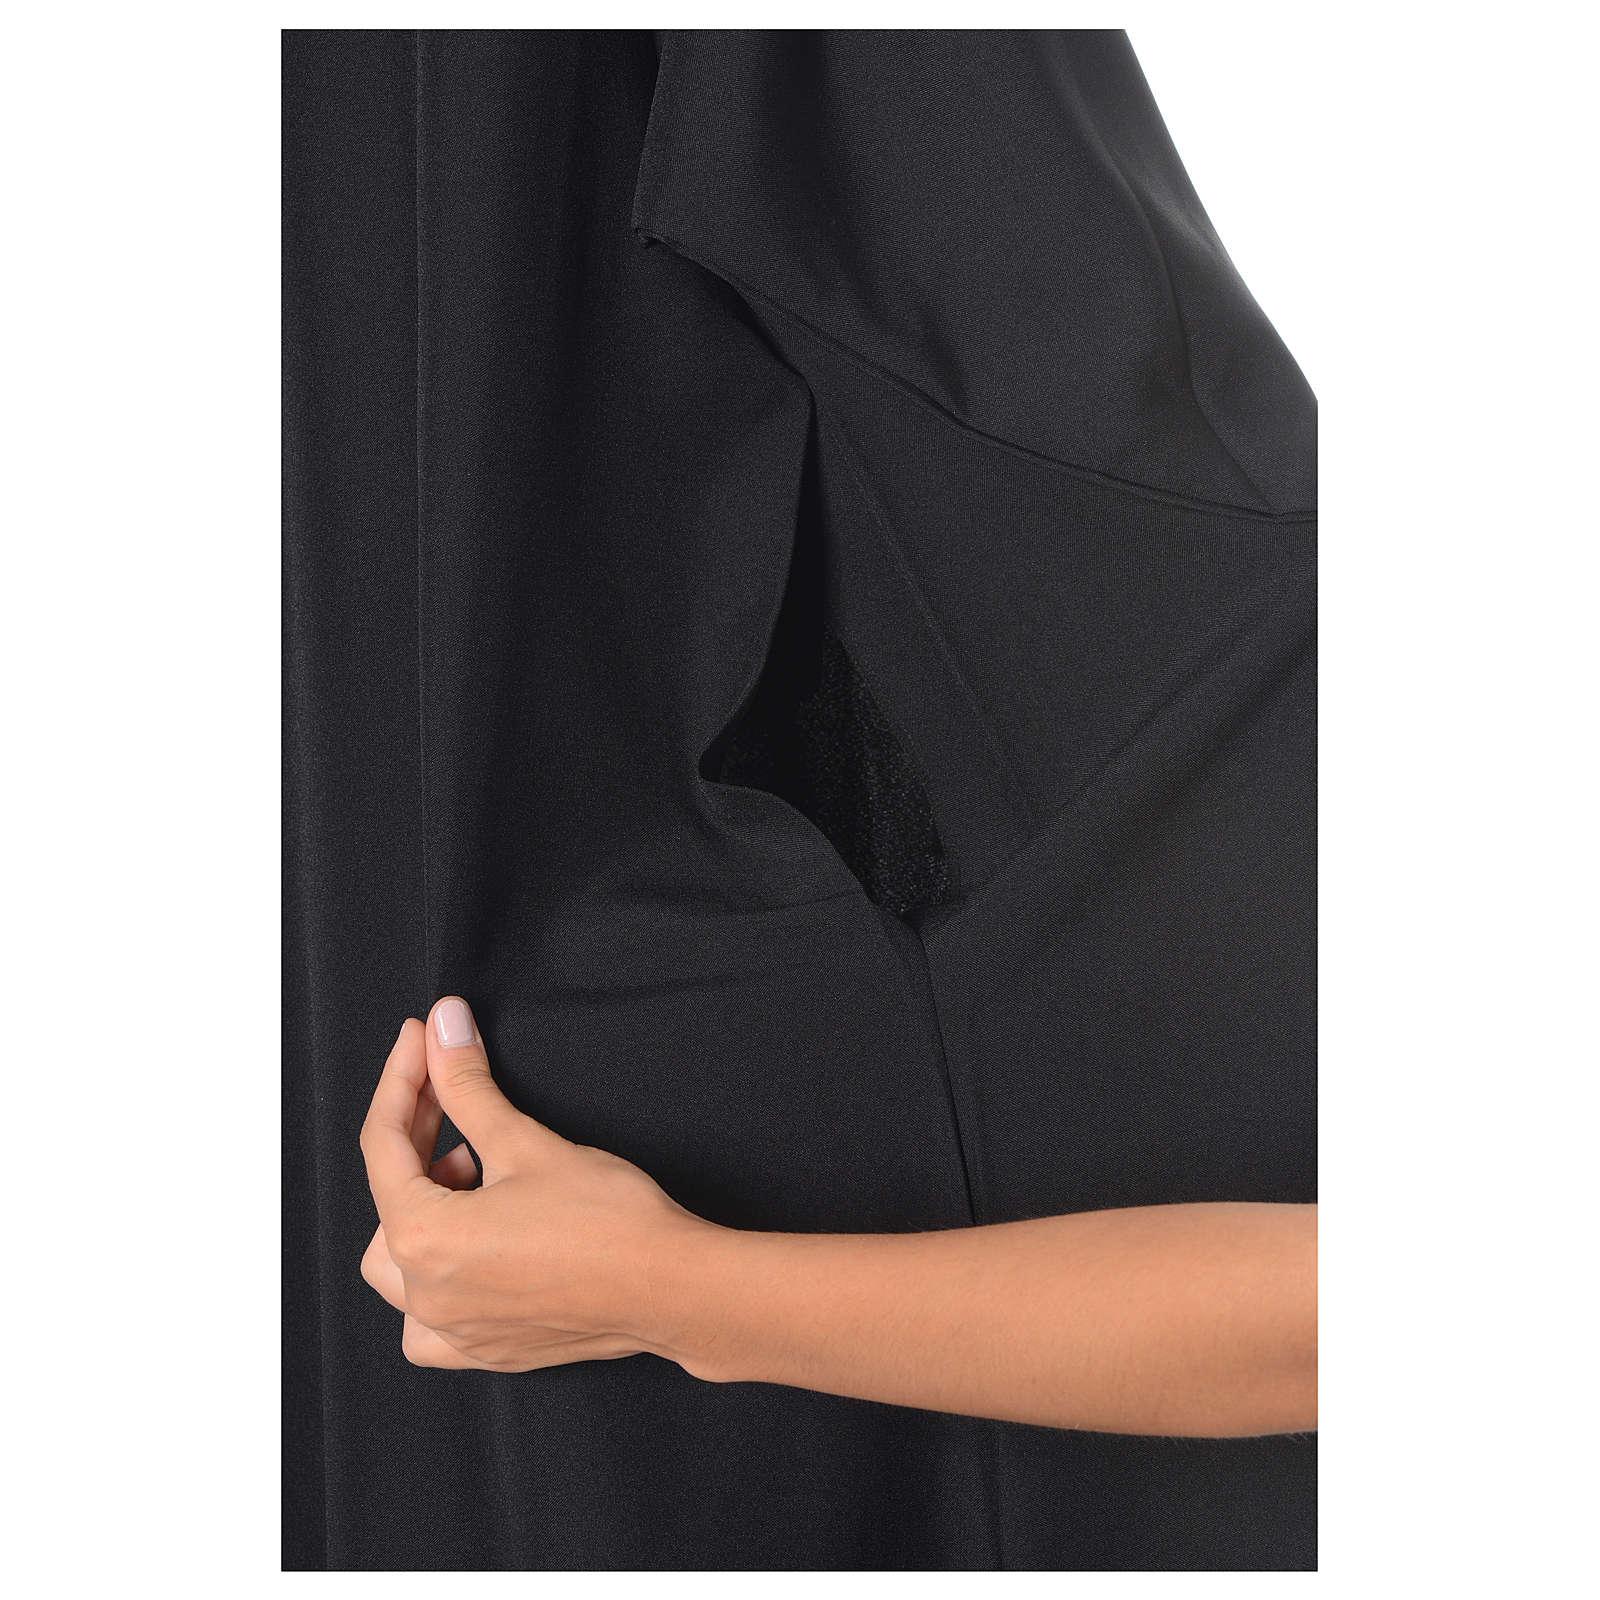 Black Alb Benedictine style in polyester 4